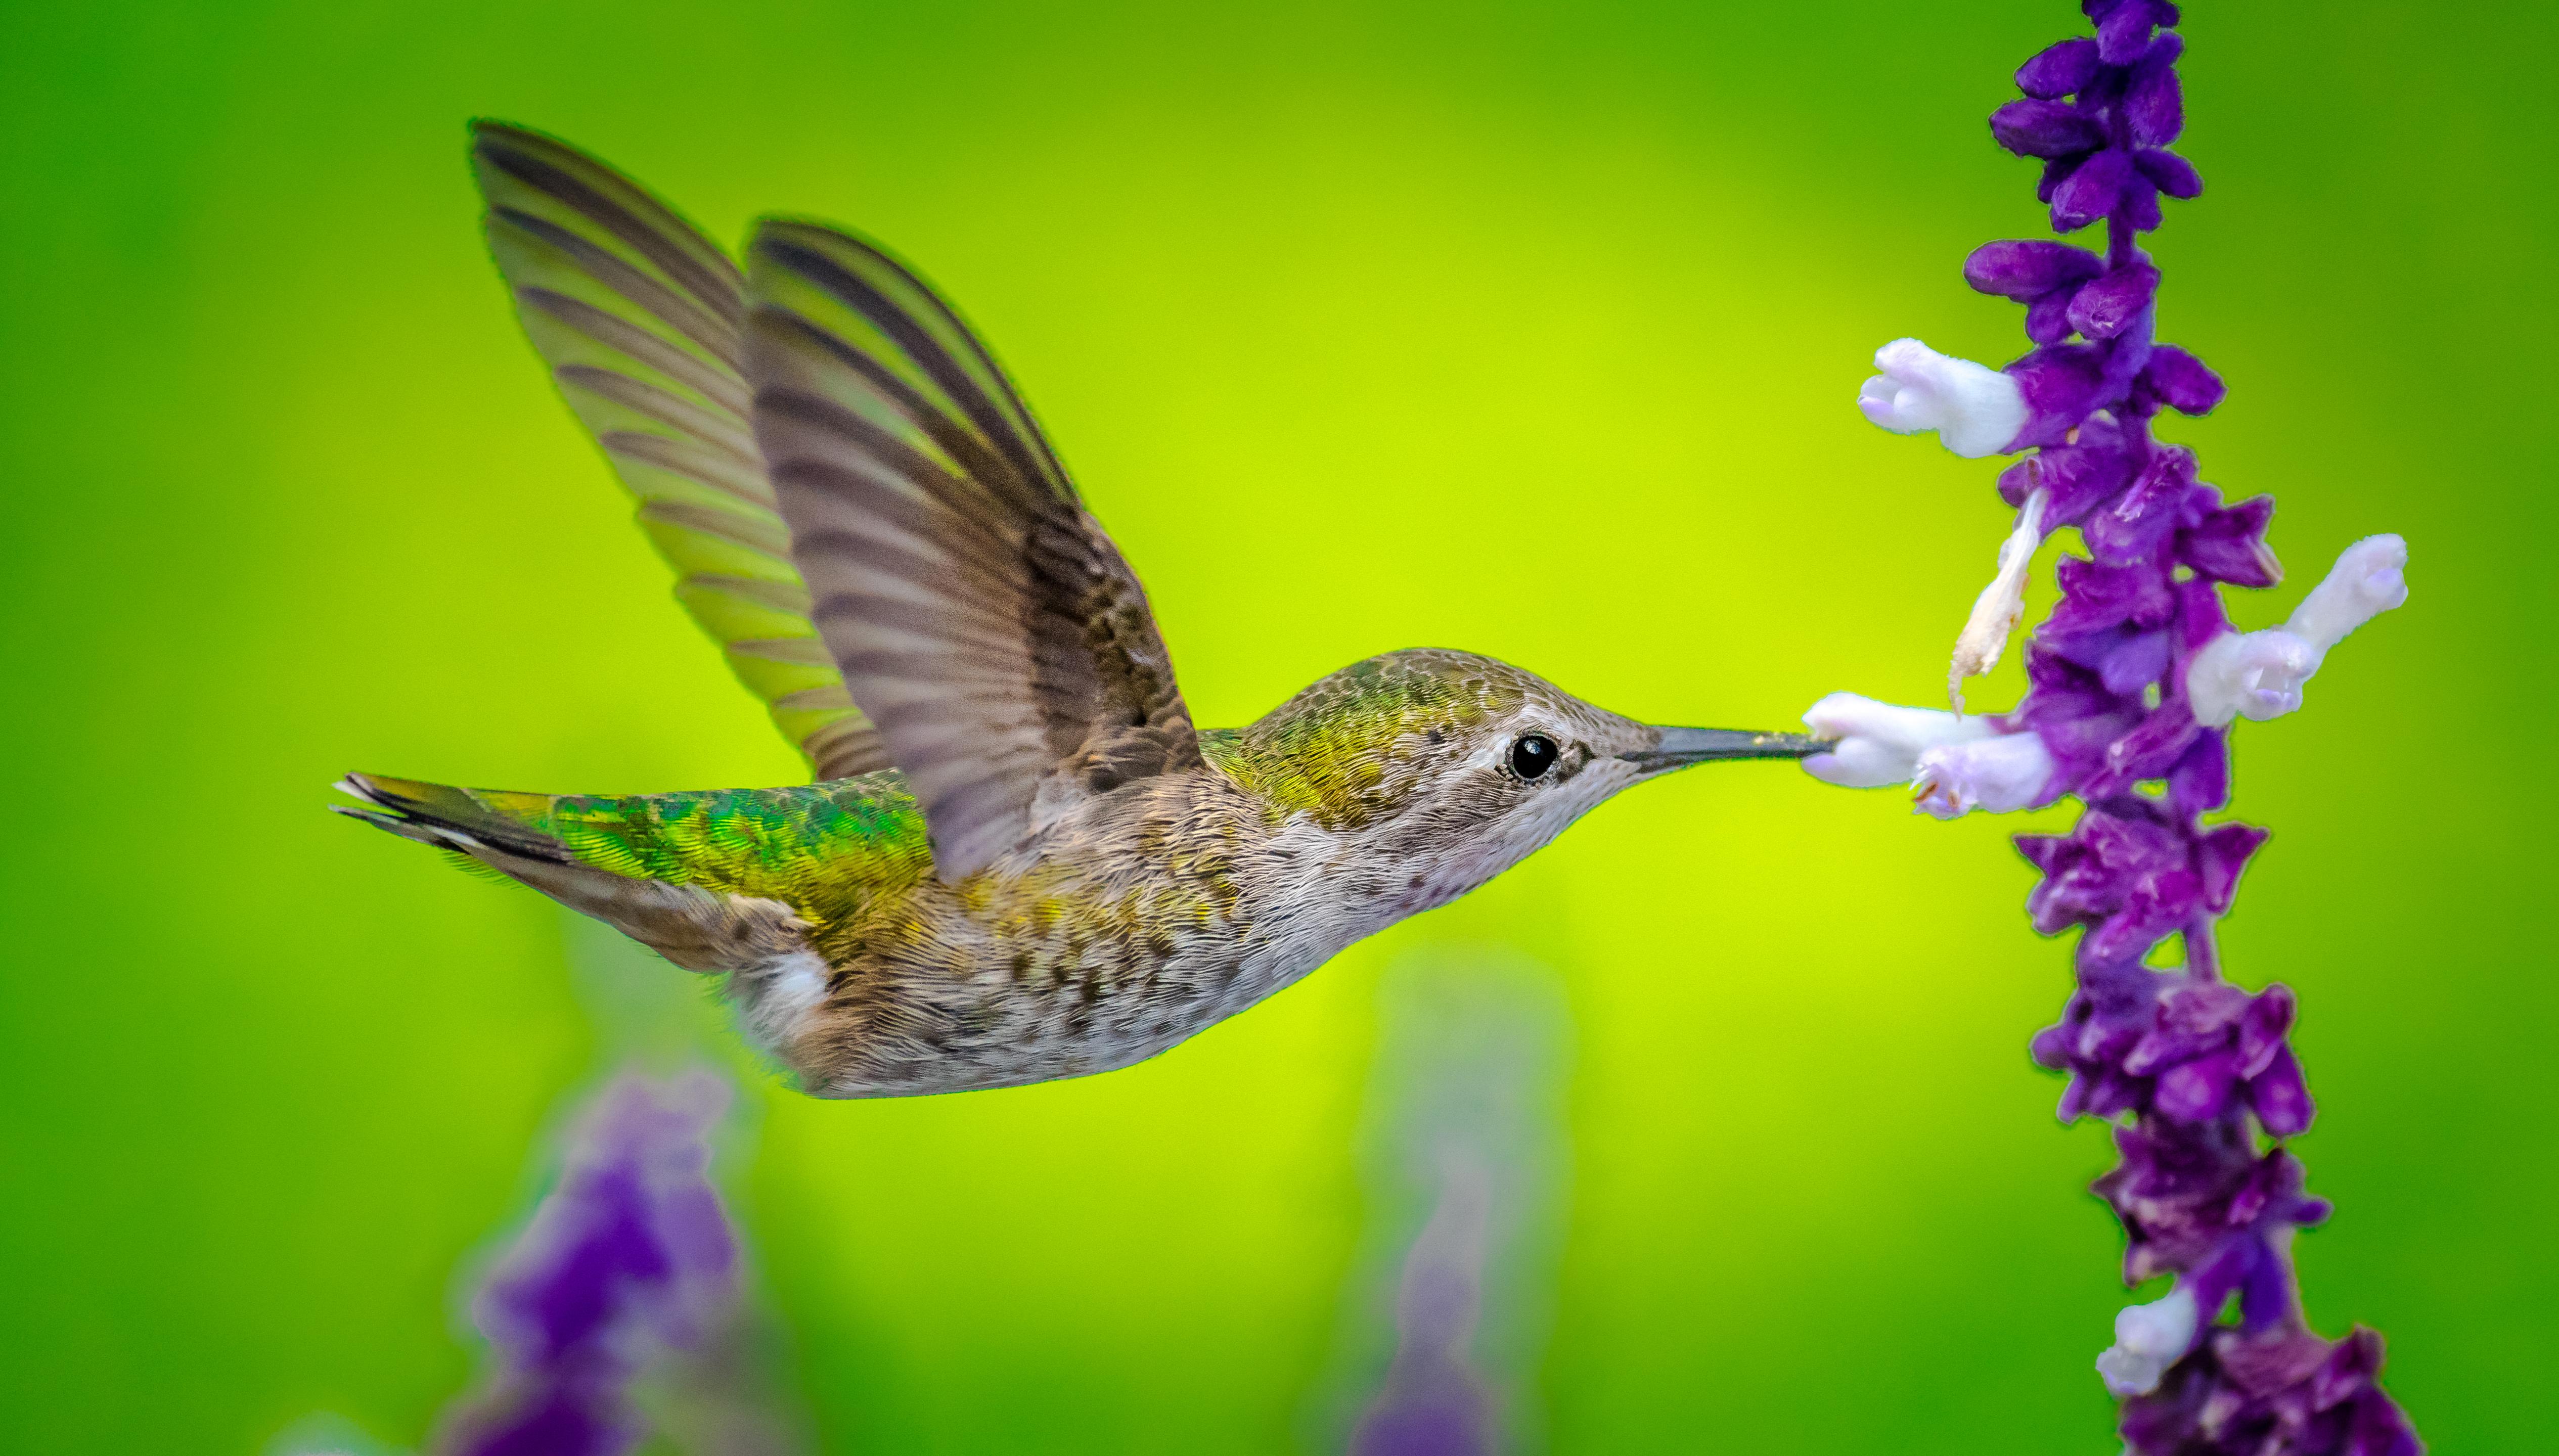 Hummingbird 4k Ultra Hd Wallpaper Background Image 5061x2880